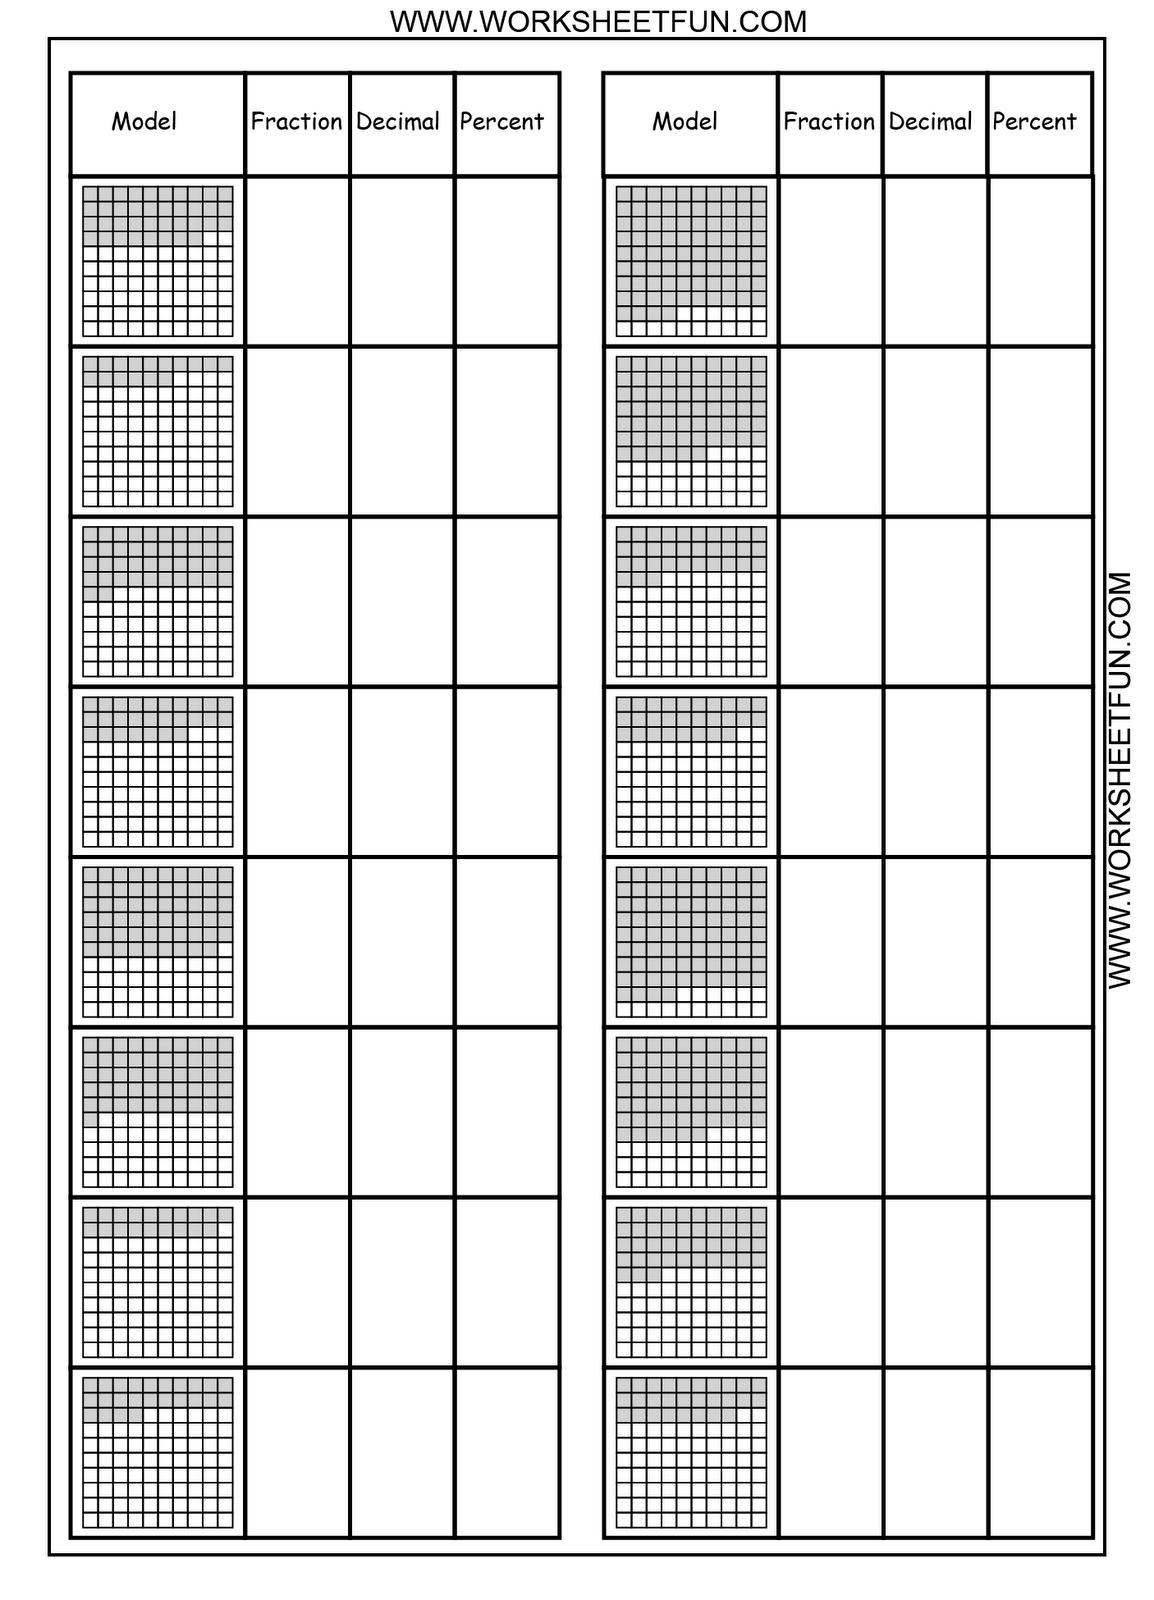 fraction decimal percent | matemática | pinterest | percents, maths